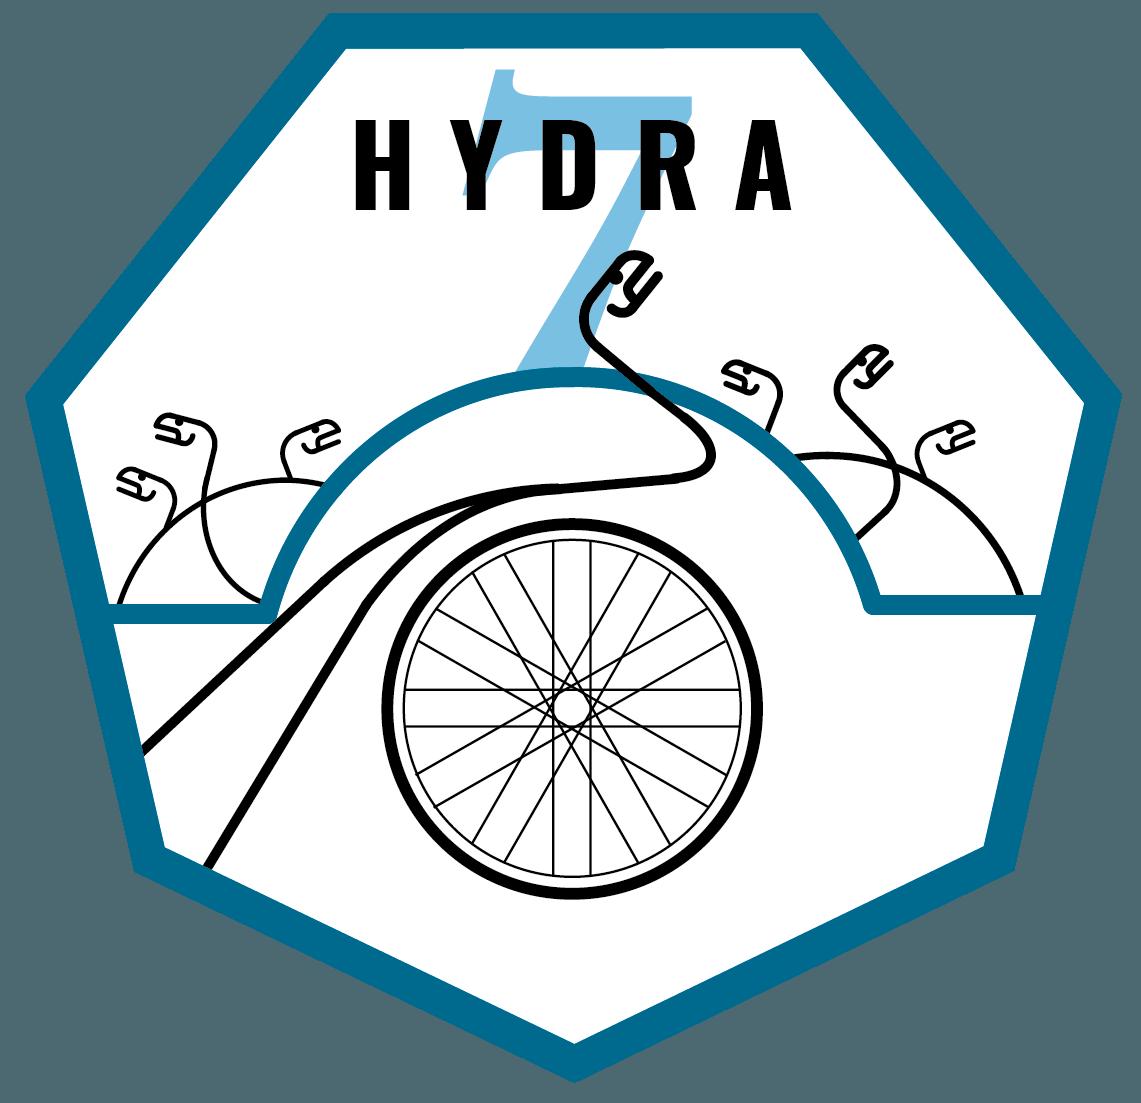 hydra-7-badge